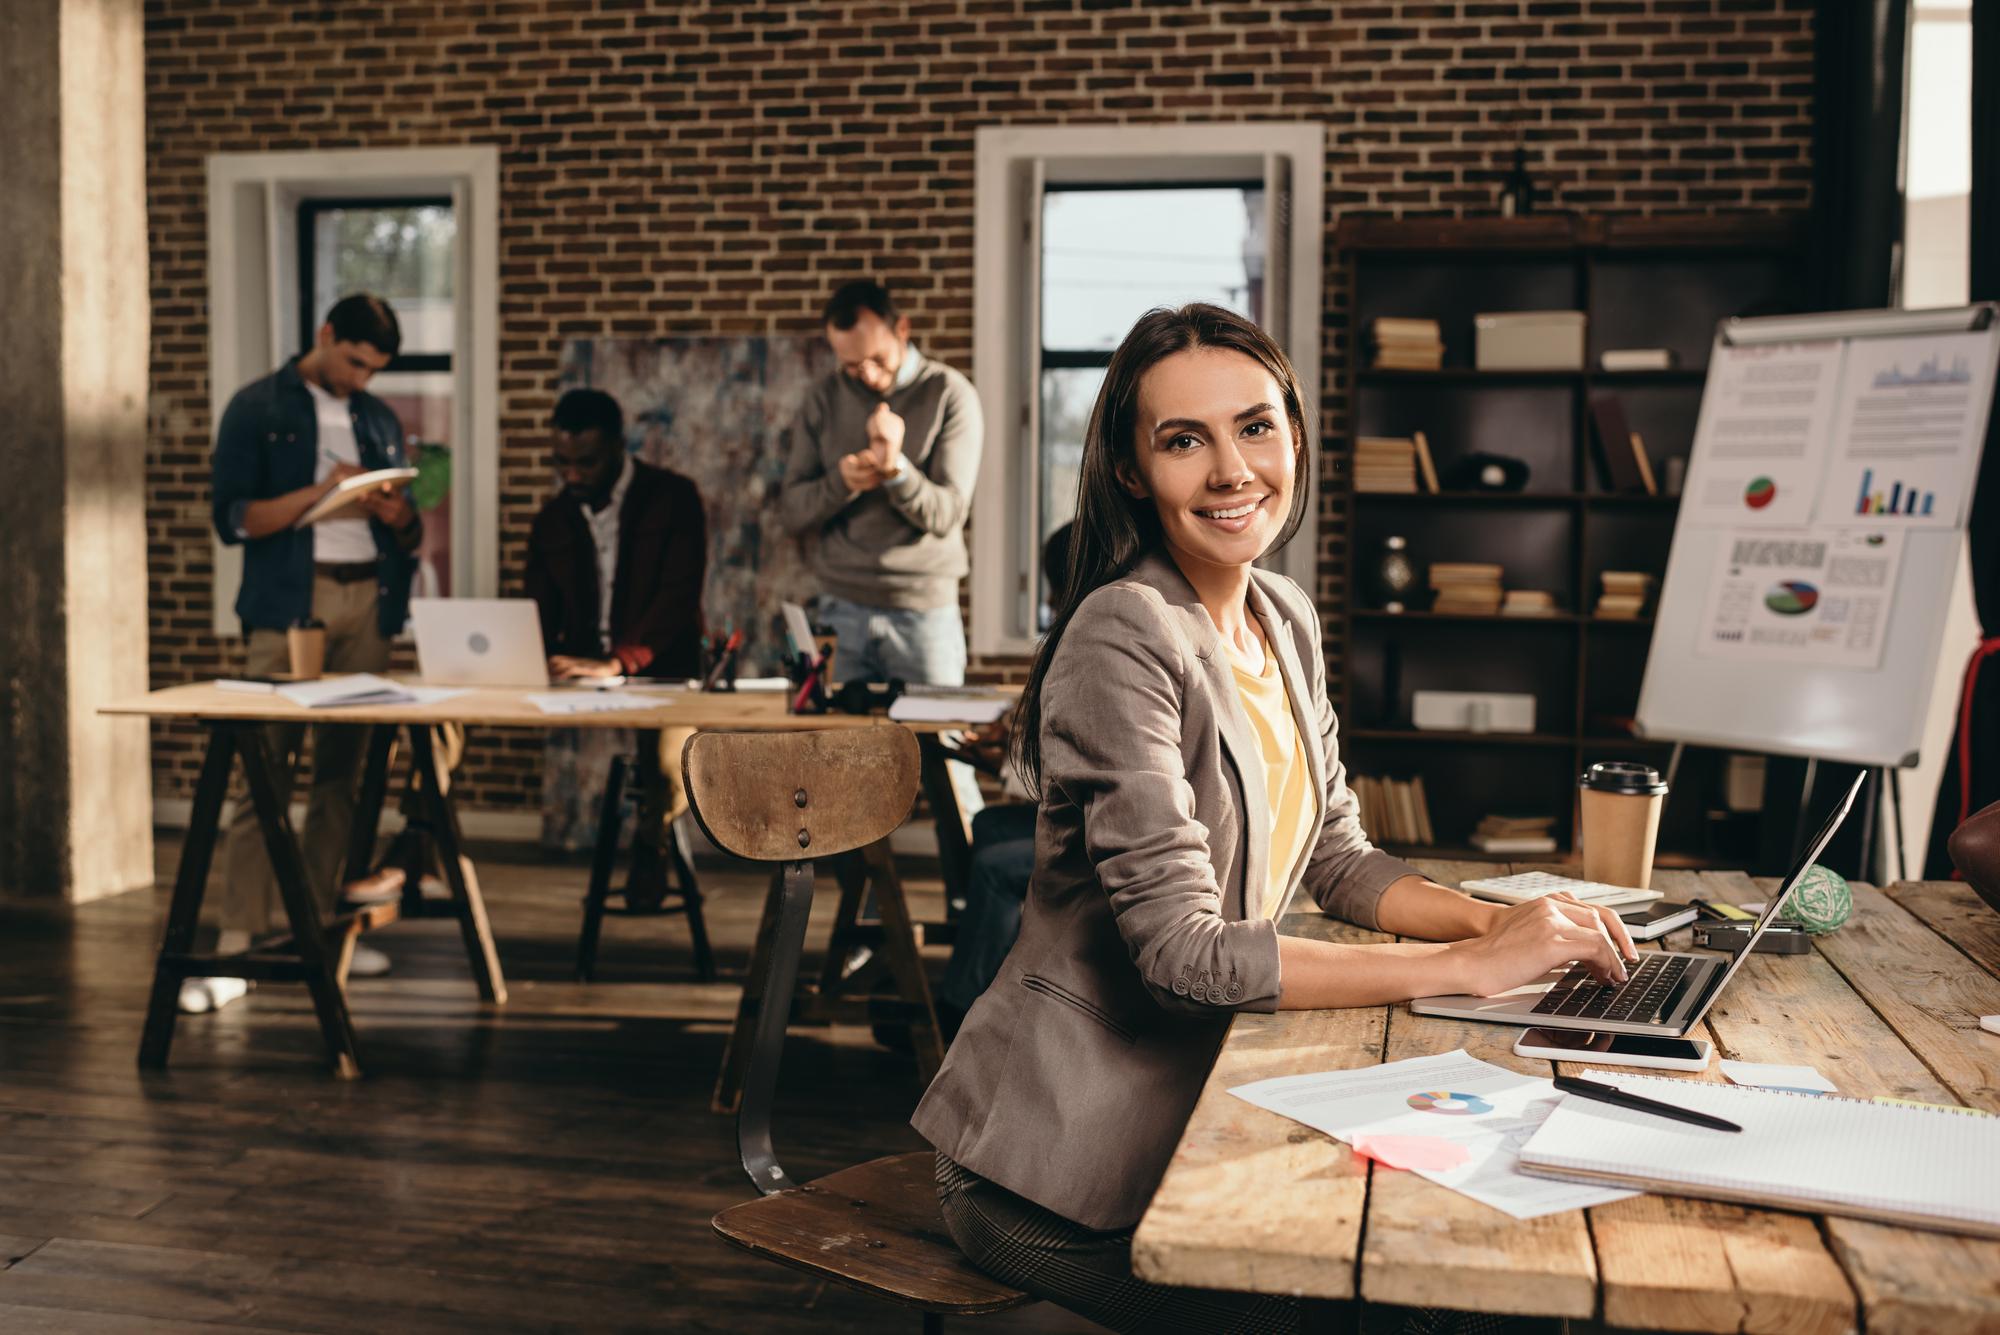 entrepreneur training consulting marketing branding services agency